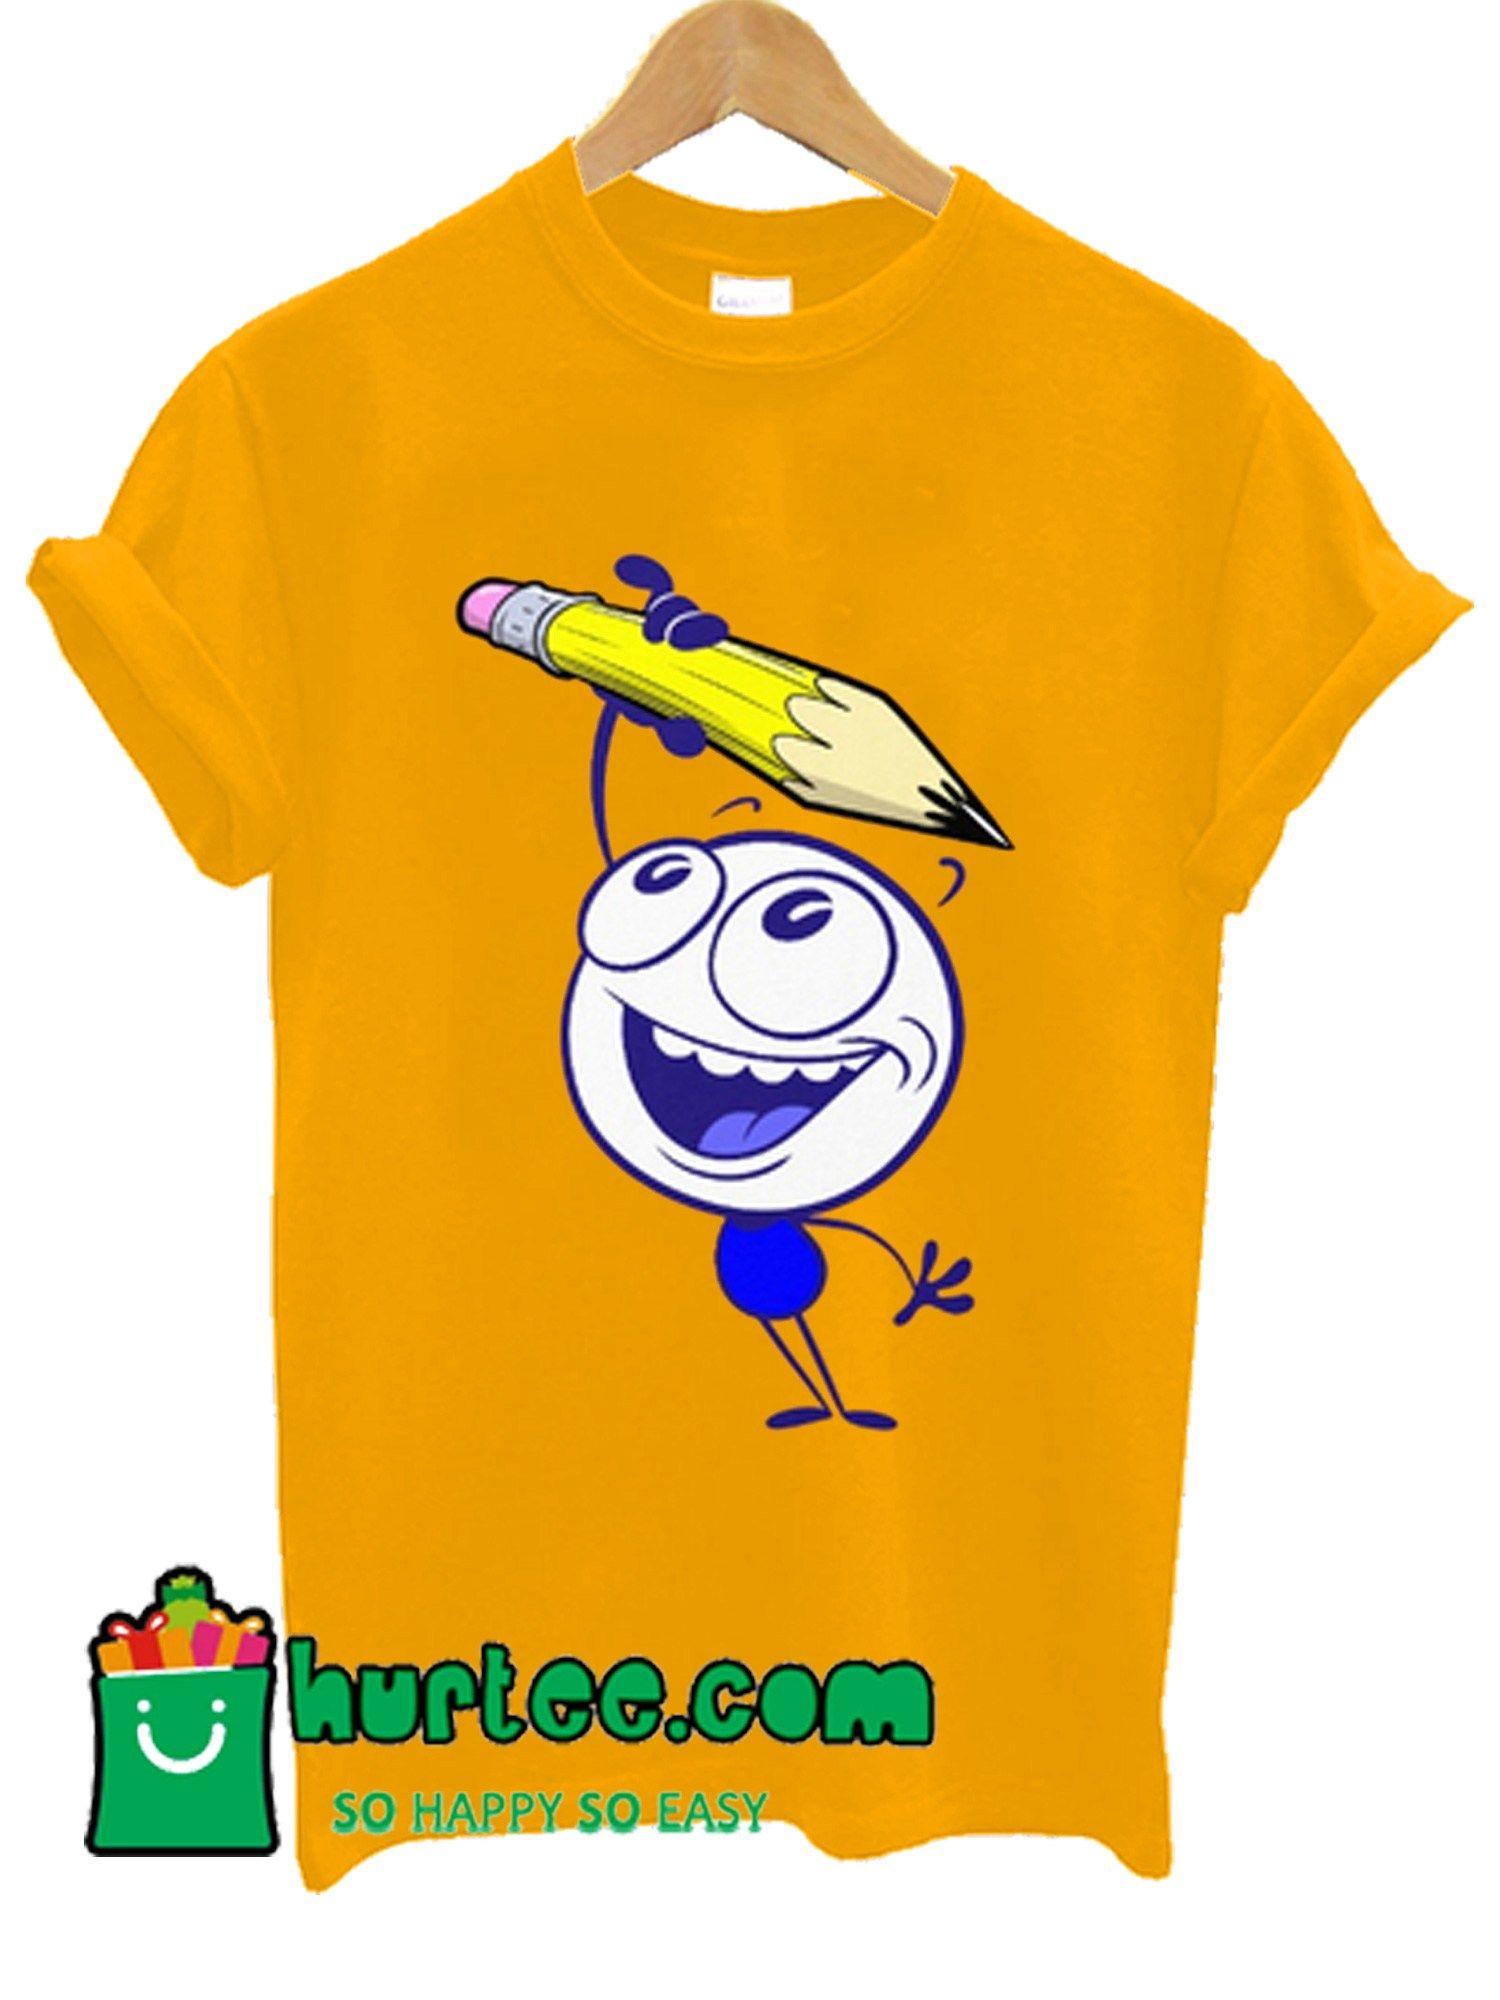 c79b2c2a5 Pencilmate T Shirt | T Shirt | T shirt, Shirts, Mens tops